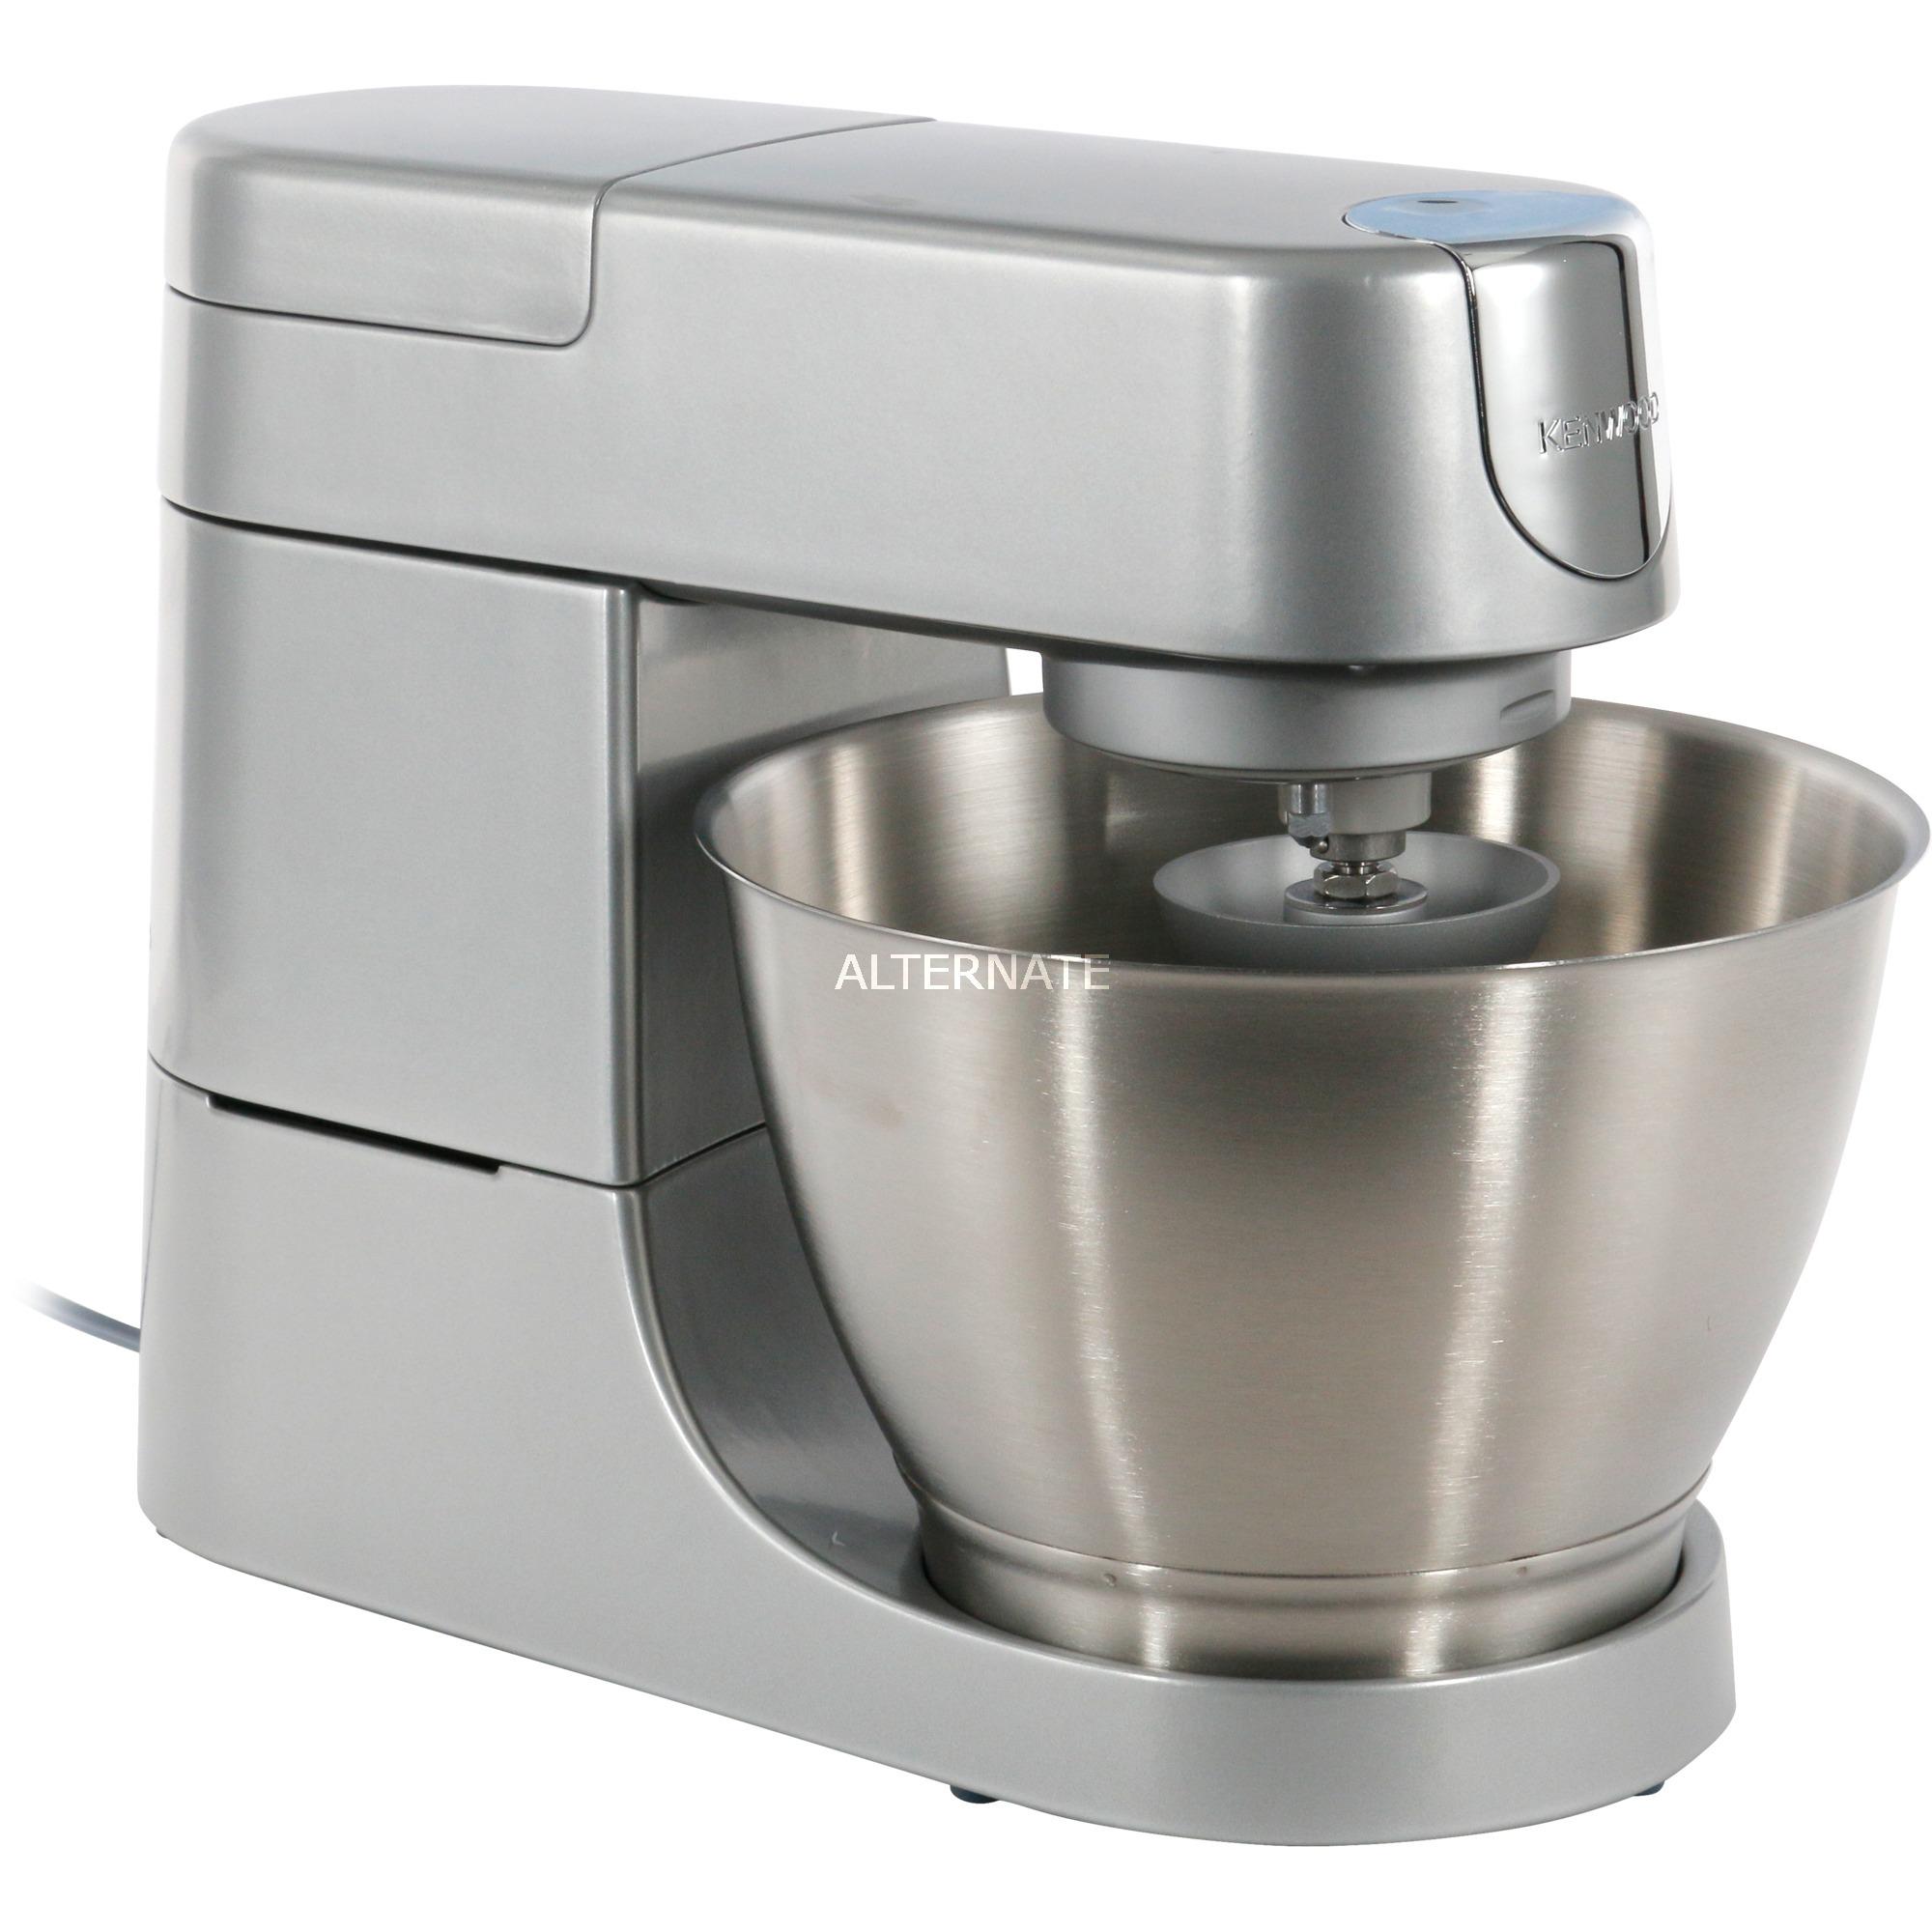 Chef KVC3100S 1000W 4.6L Plata robot de cocina